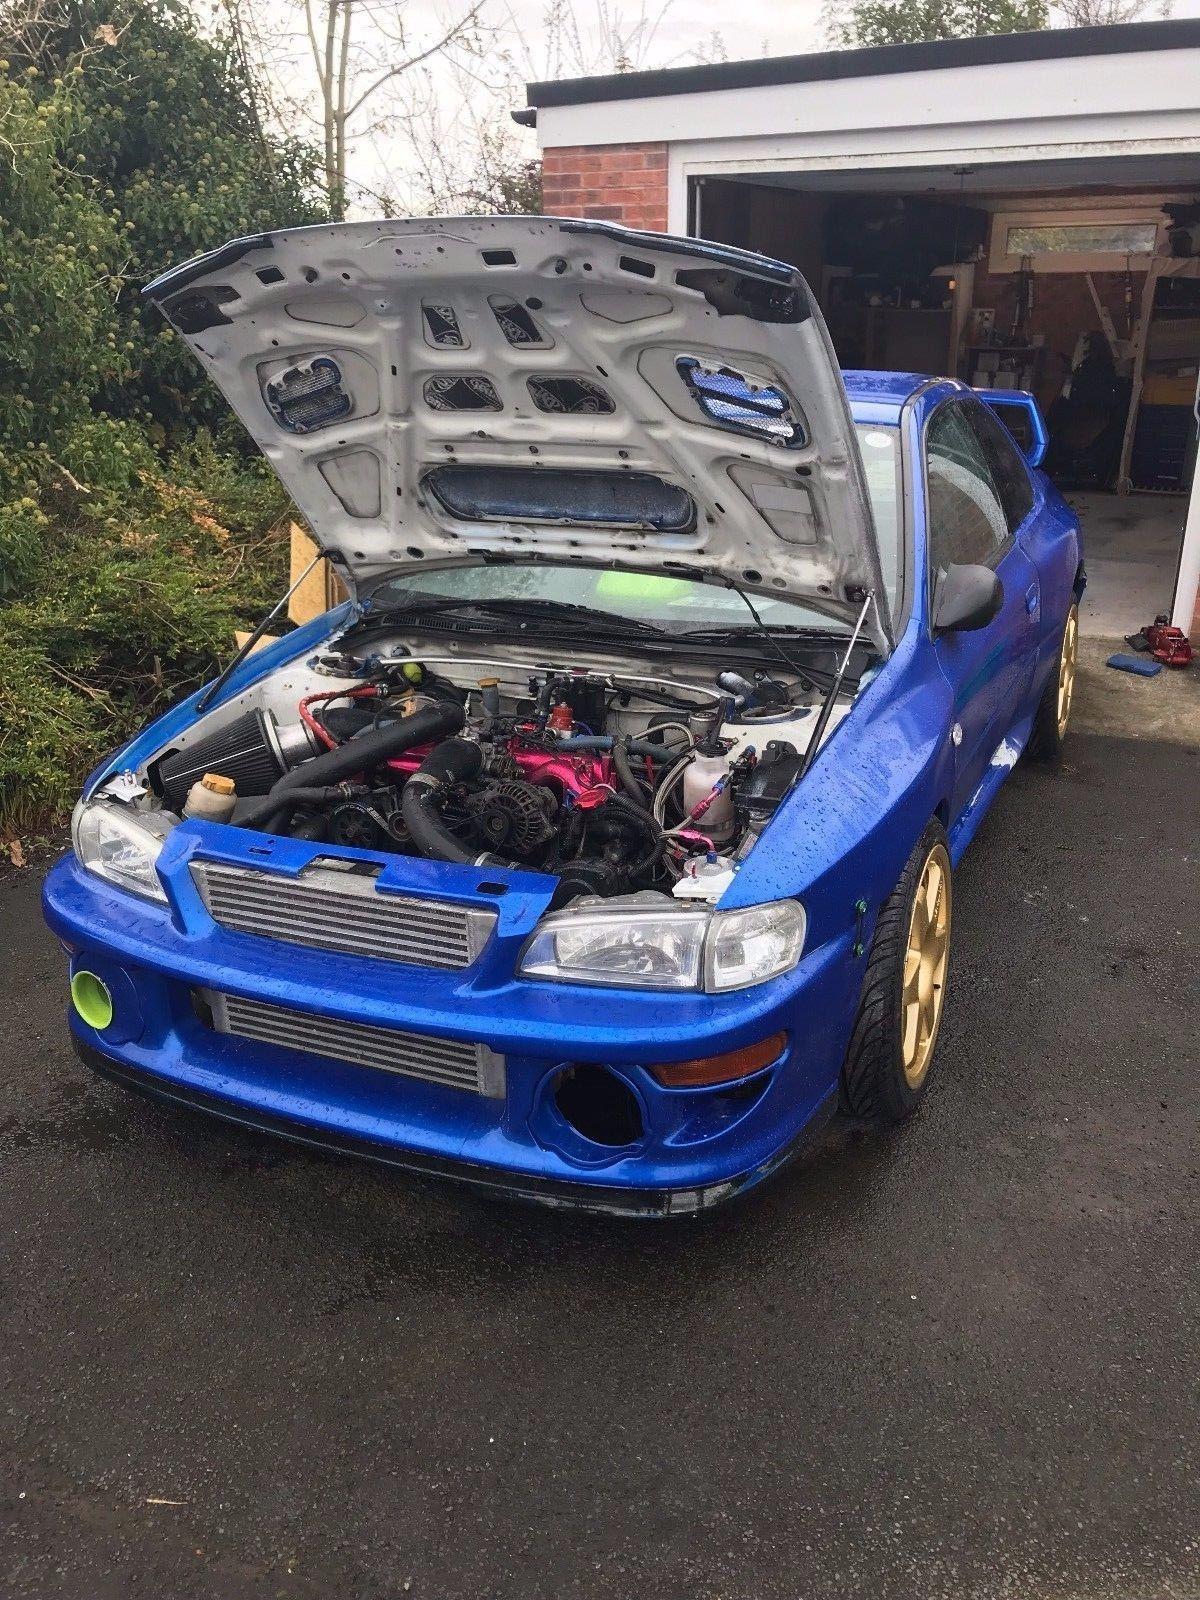 This subaru impreza wrc wrx sti type r race car 600bhp hill climb is ...